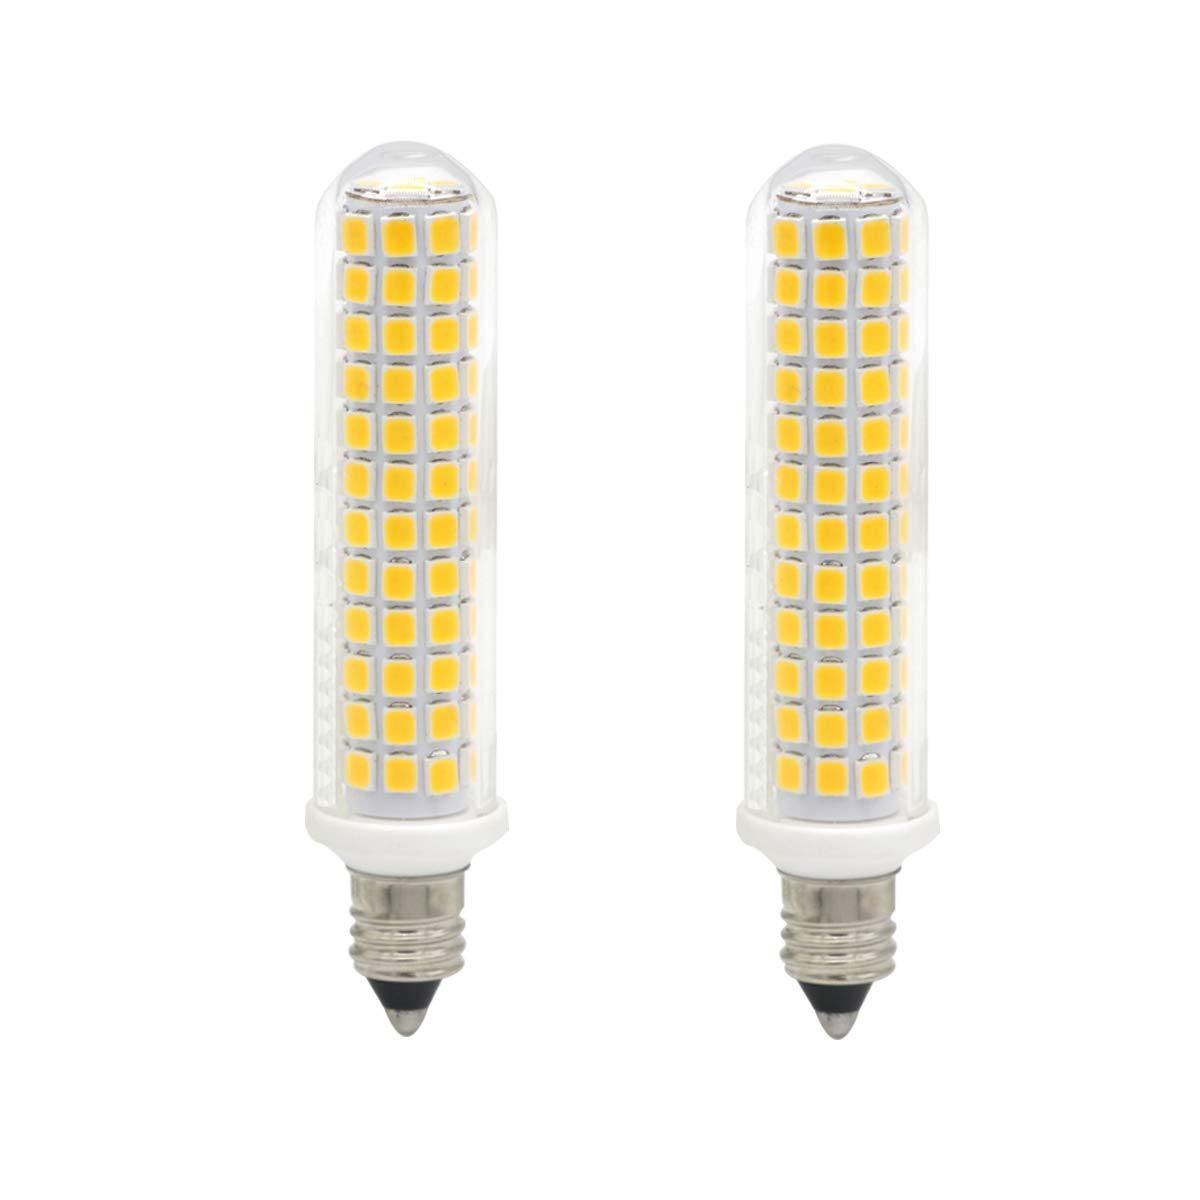 Ylaide E11 Led Light Bulb 100w Halogen Bulbs Equivalent